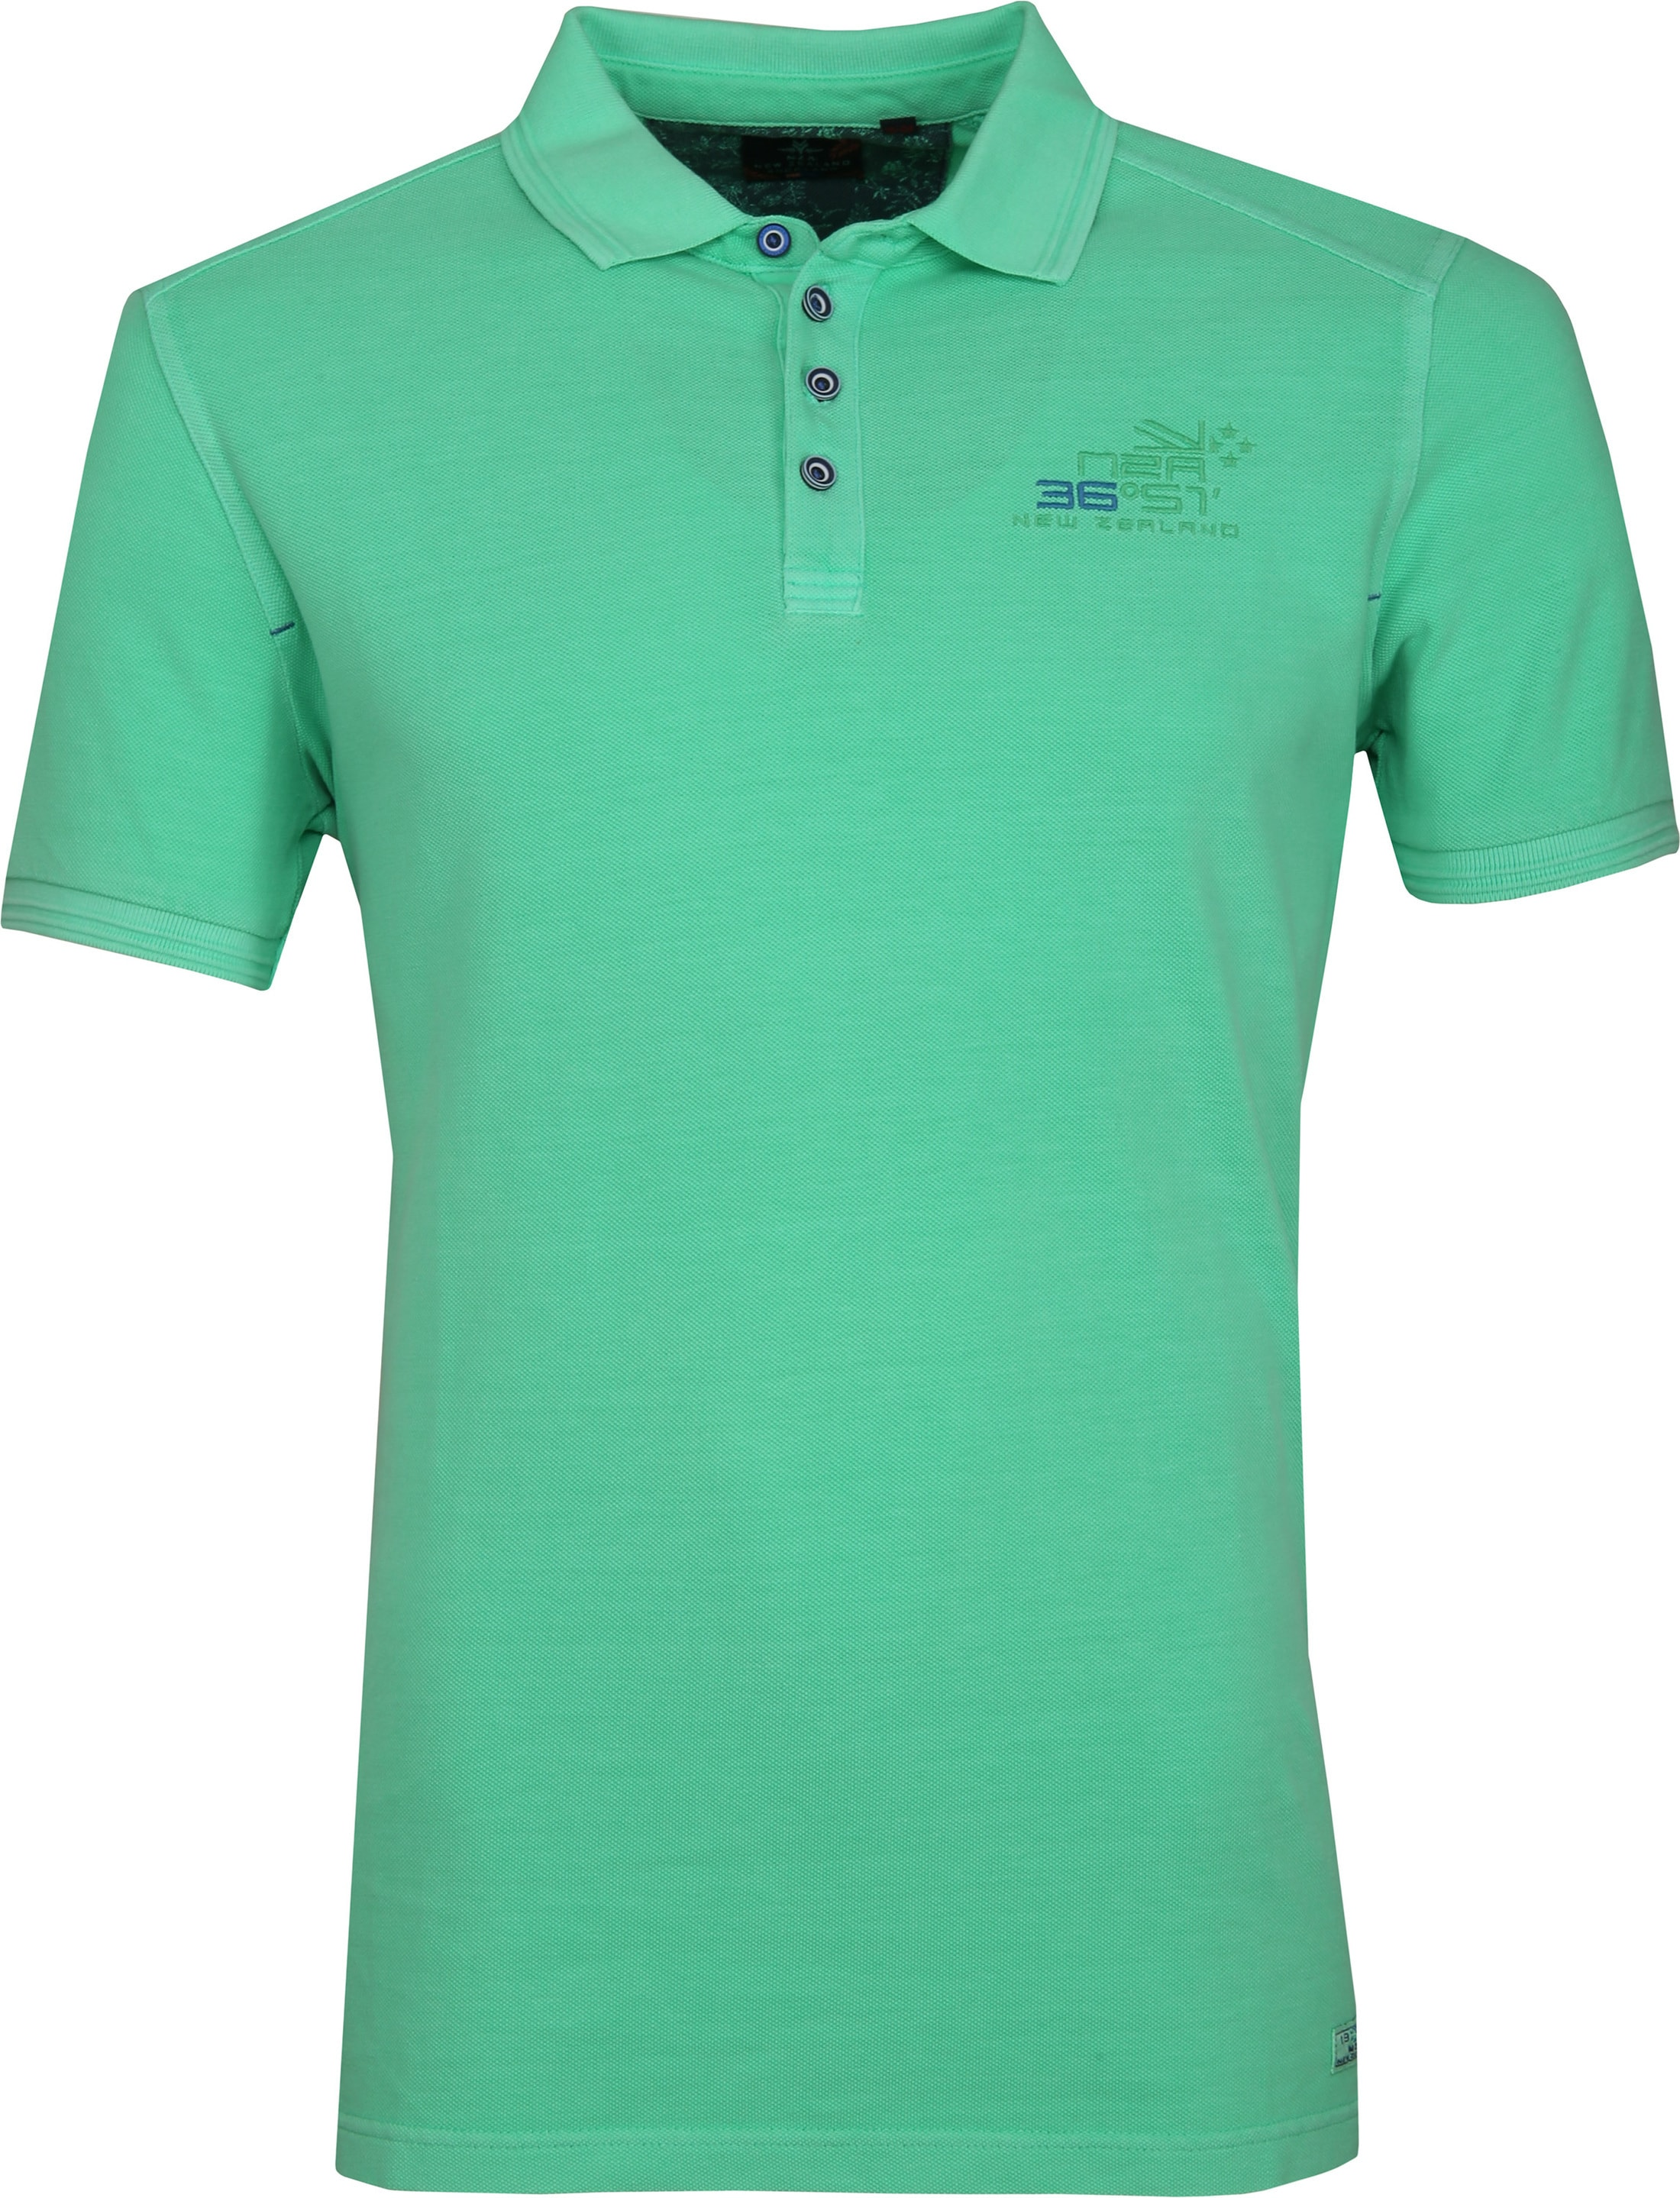 NZA Oakura Poloshirt Neon Groen foto 0